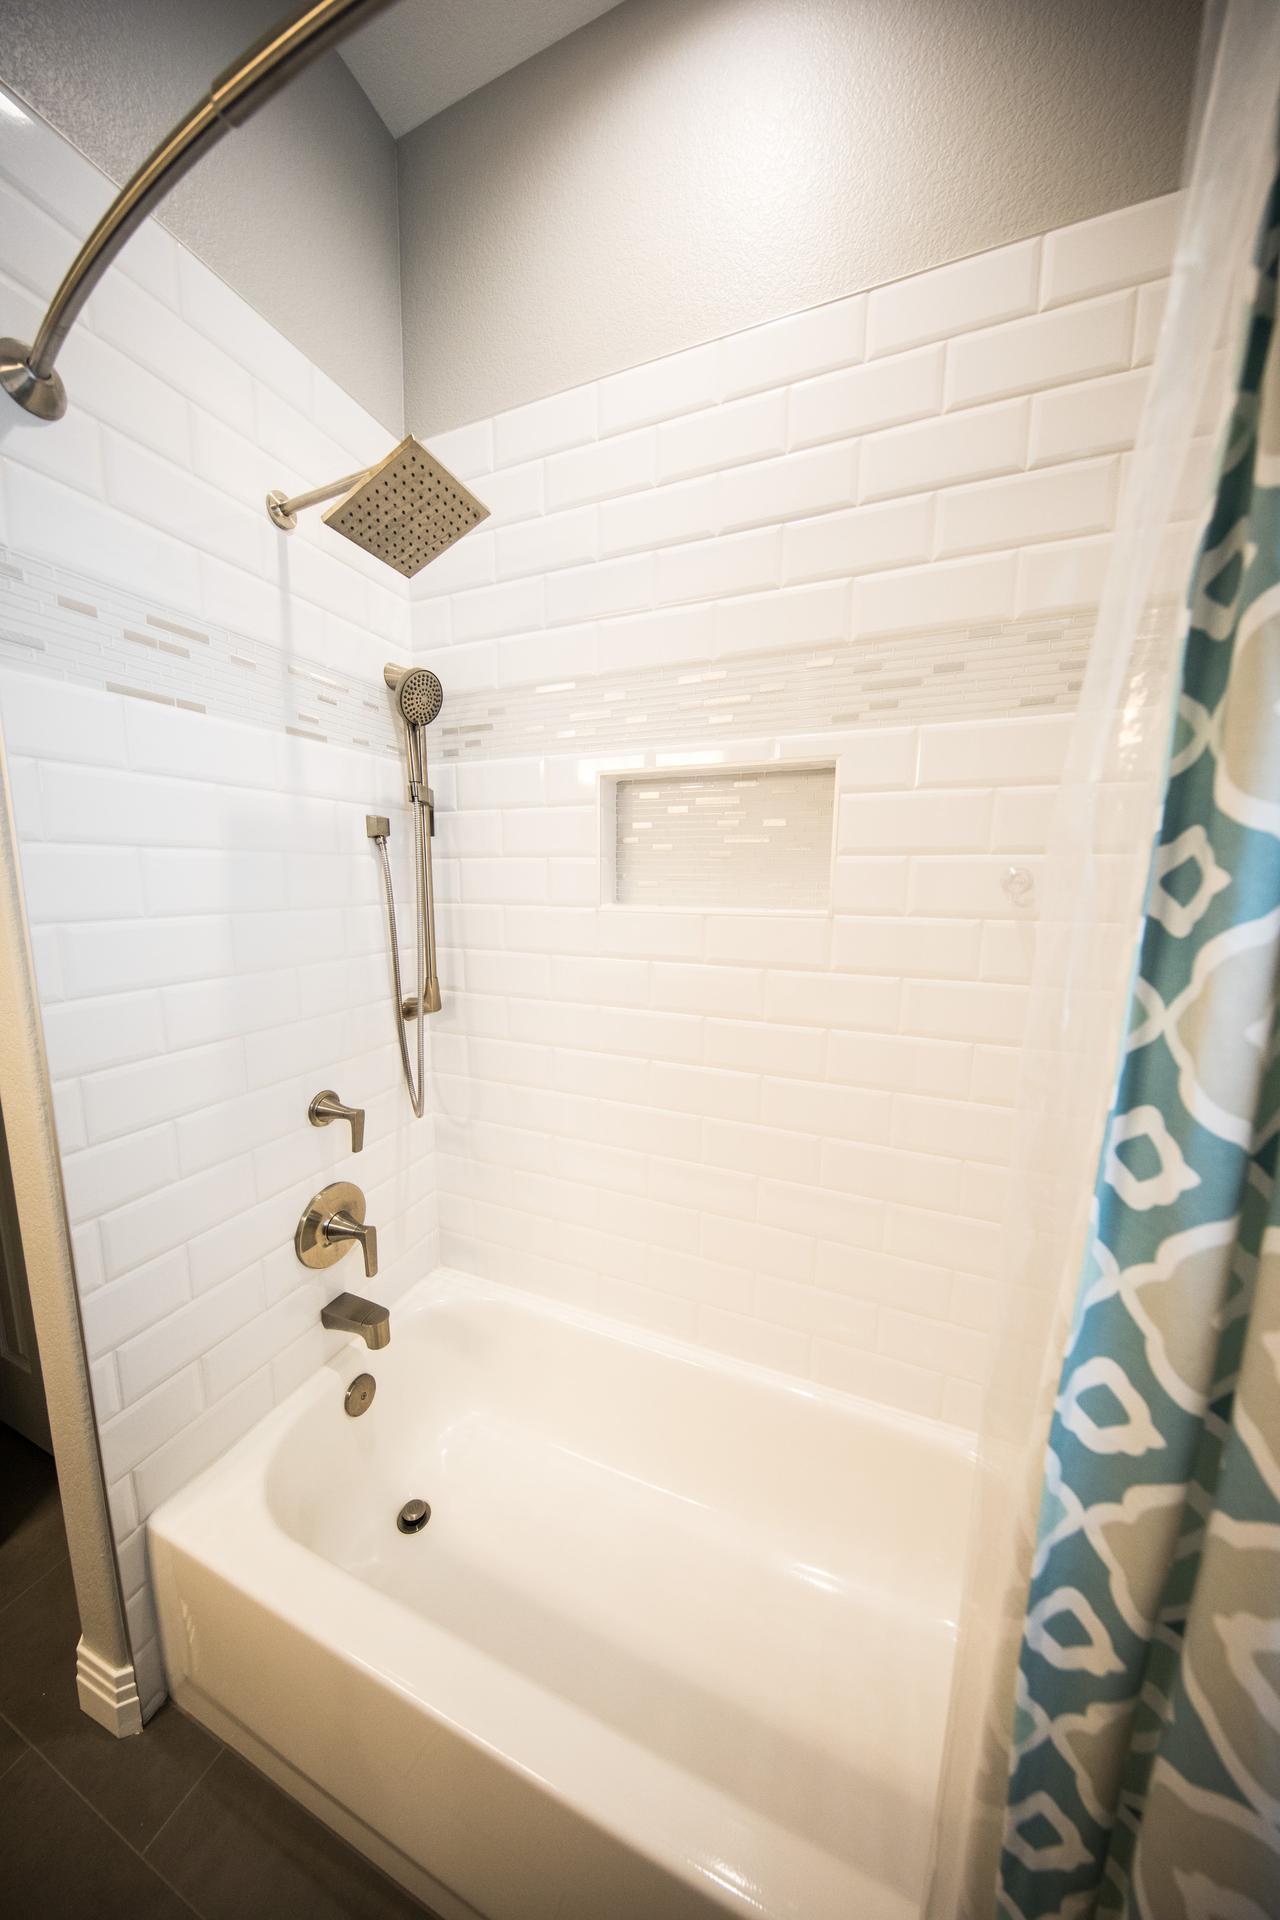 Top 5 warning signs you need bathtub repair in Dallas